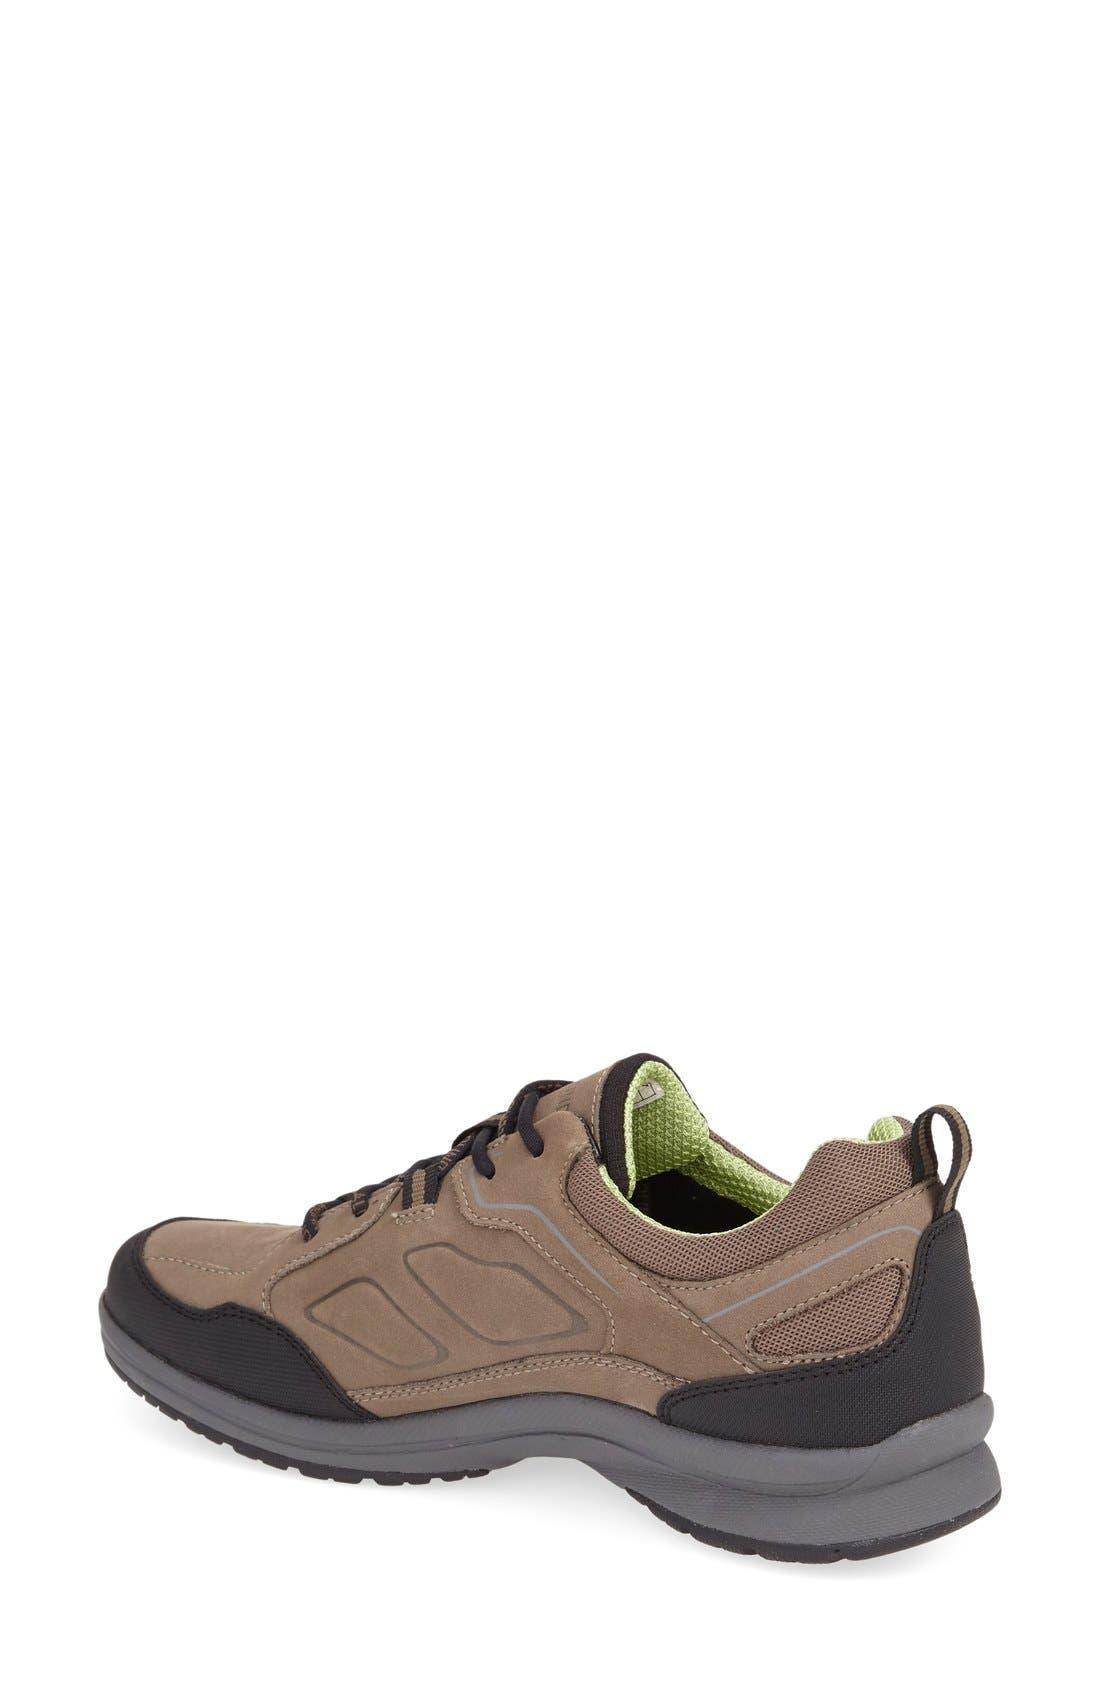 ALLROUNDER BY MEPHISTO, 'Dascha Tex' Waterproof Sneaker, Alternate thumbnail 2, color, 057